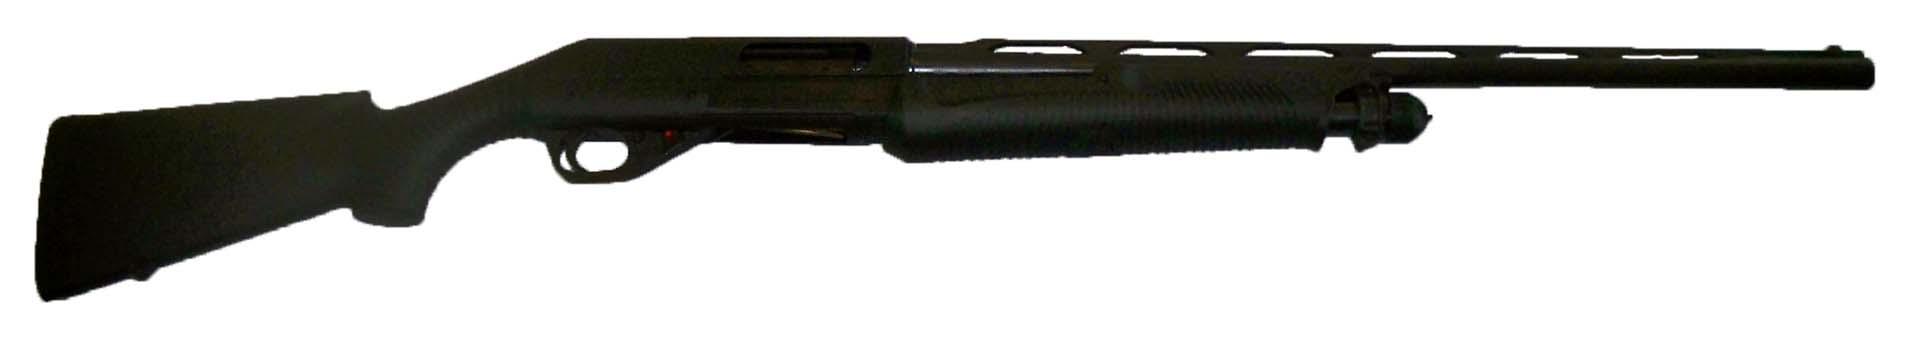 Benelli vinci 24 apg camo 12 gauge for 12 ga recoil table